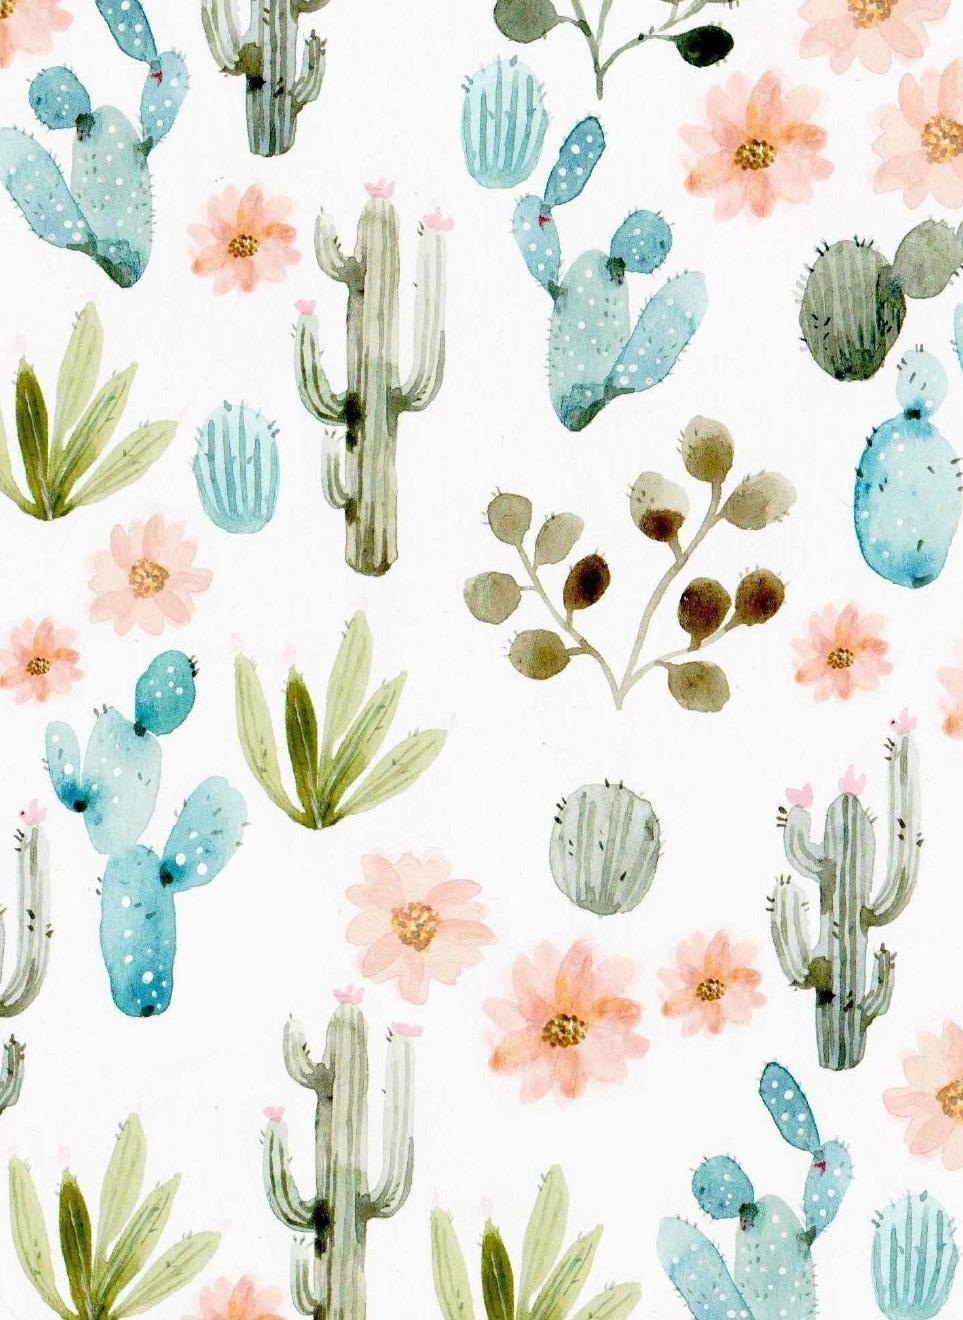 Background clipart cactus #9